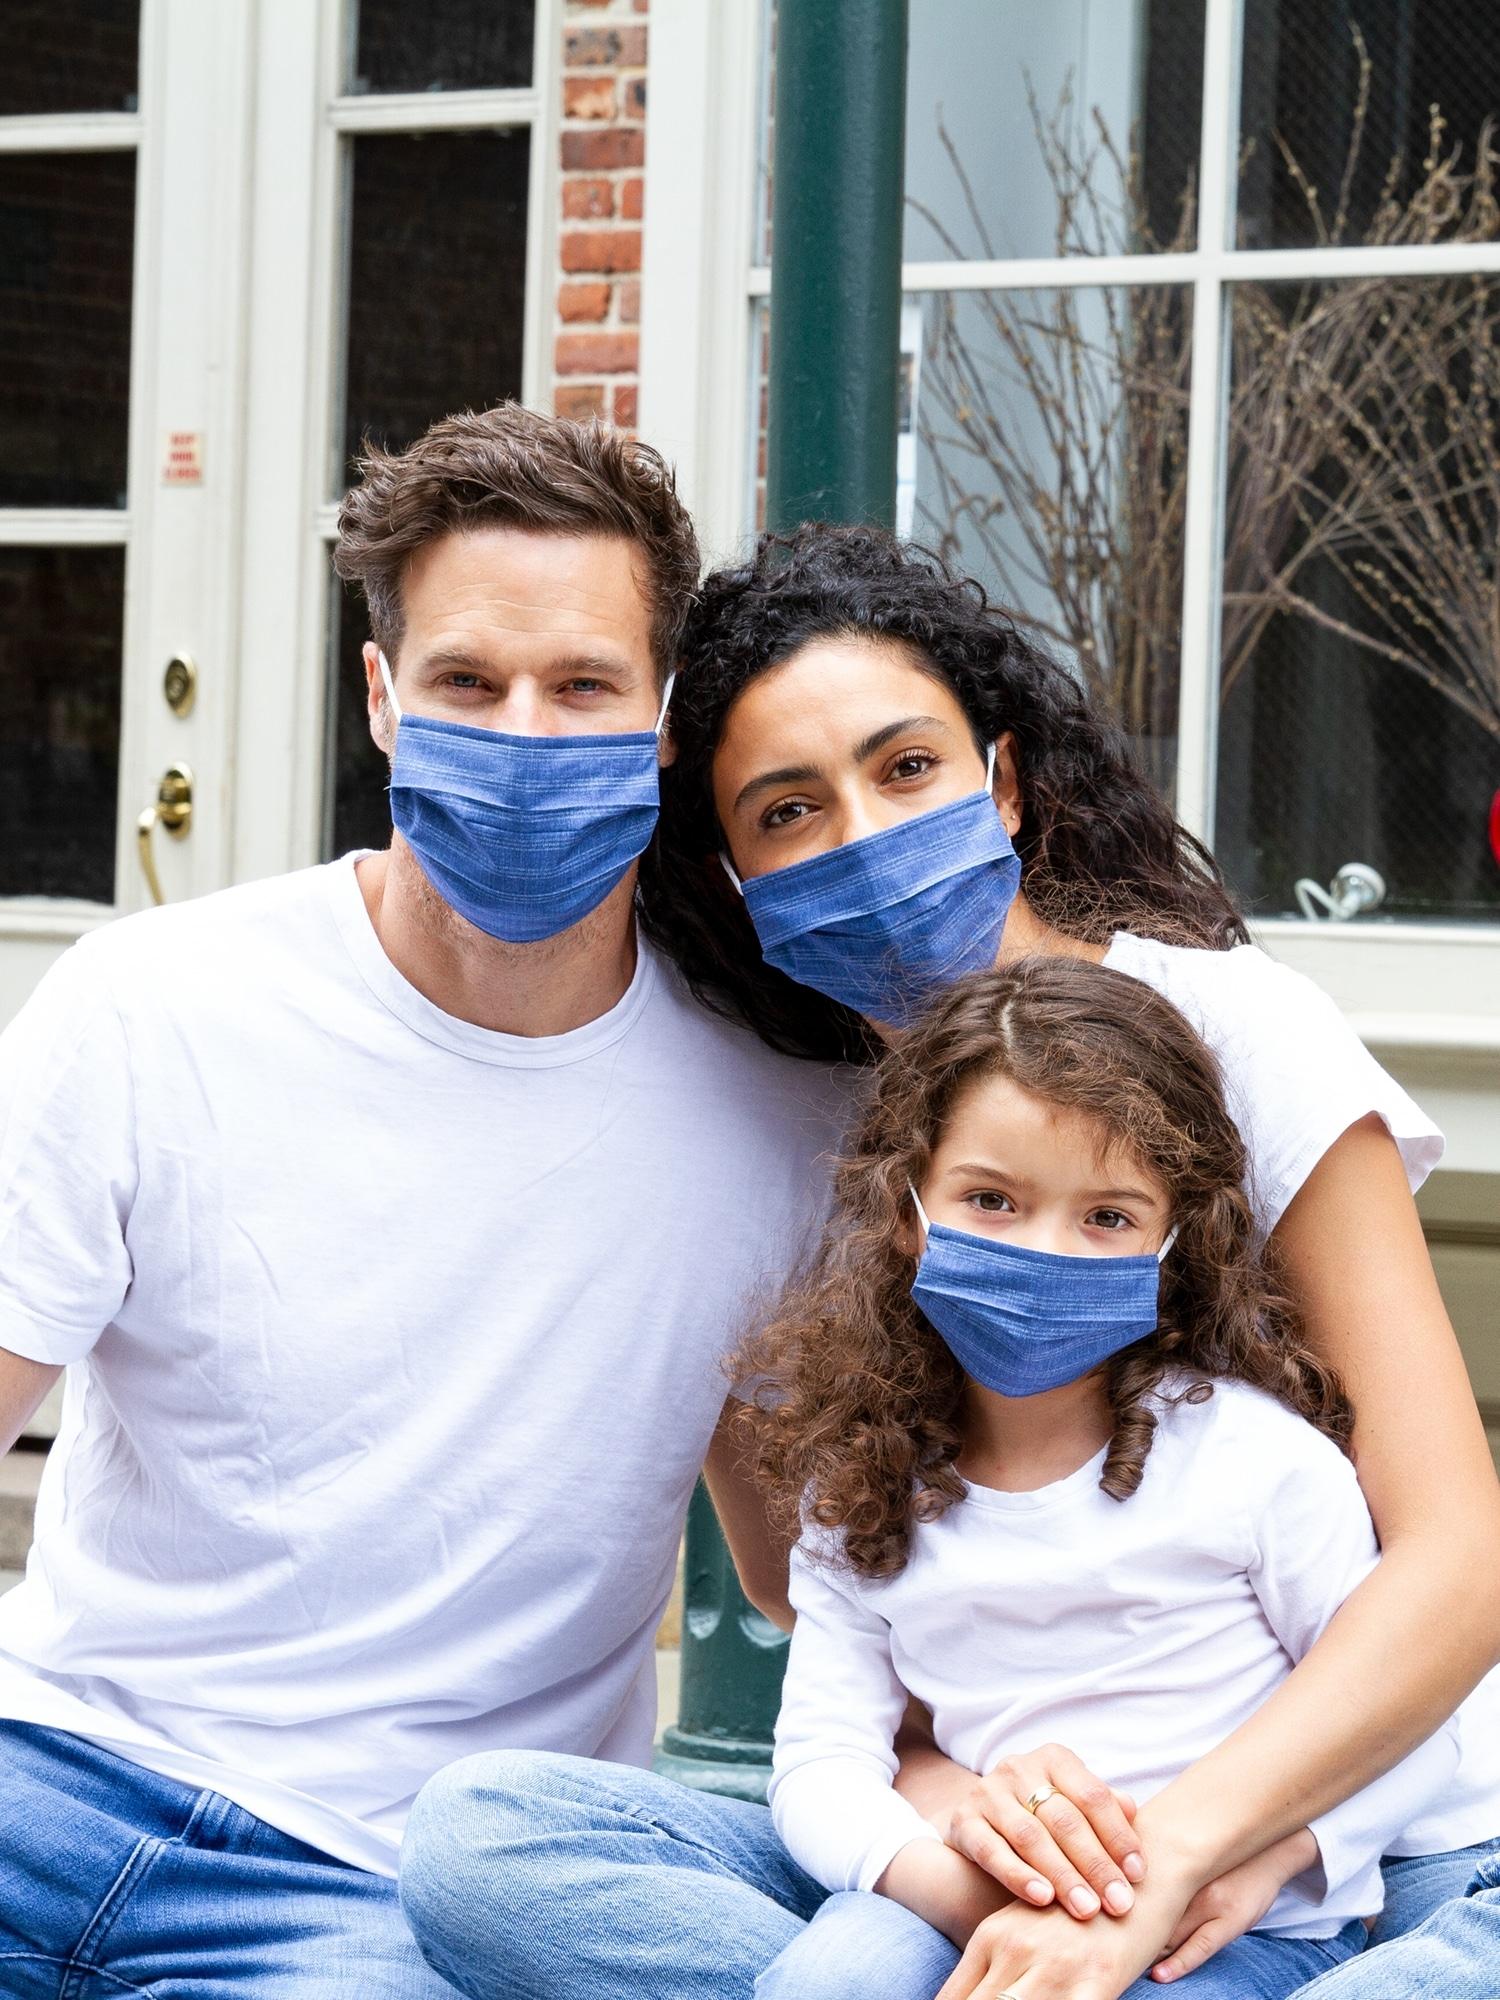 100/% Cotton Breathable /& Washable Child Masks KUONA Kids Face Mask Adjustable with Filter Pocket